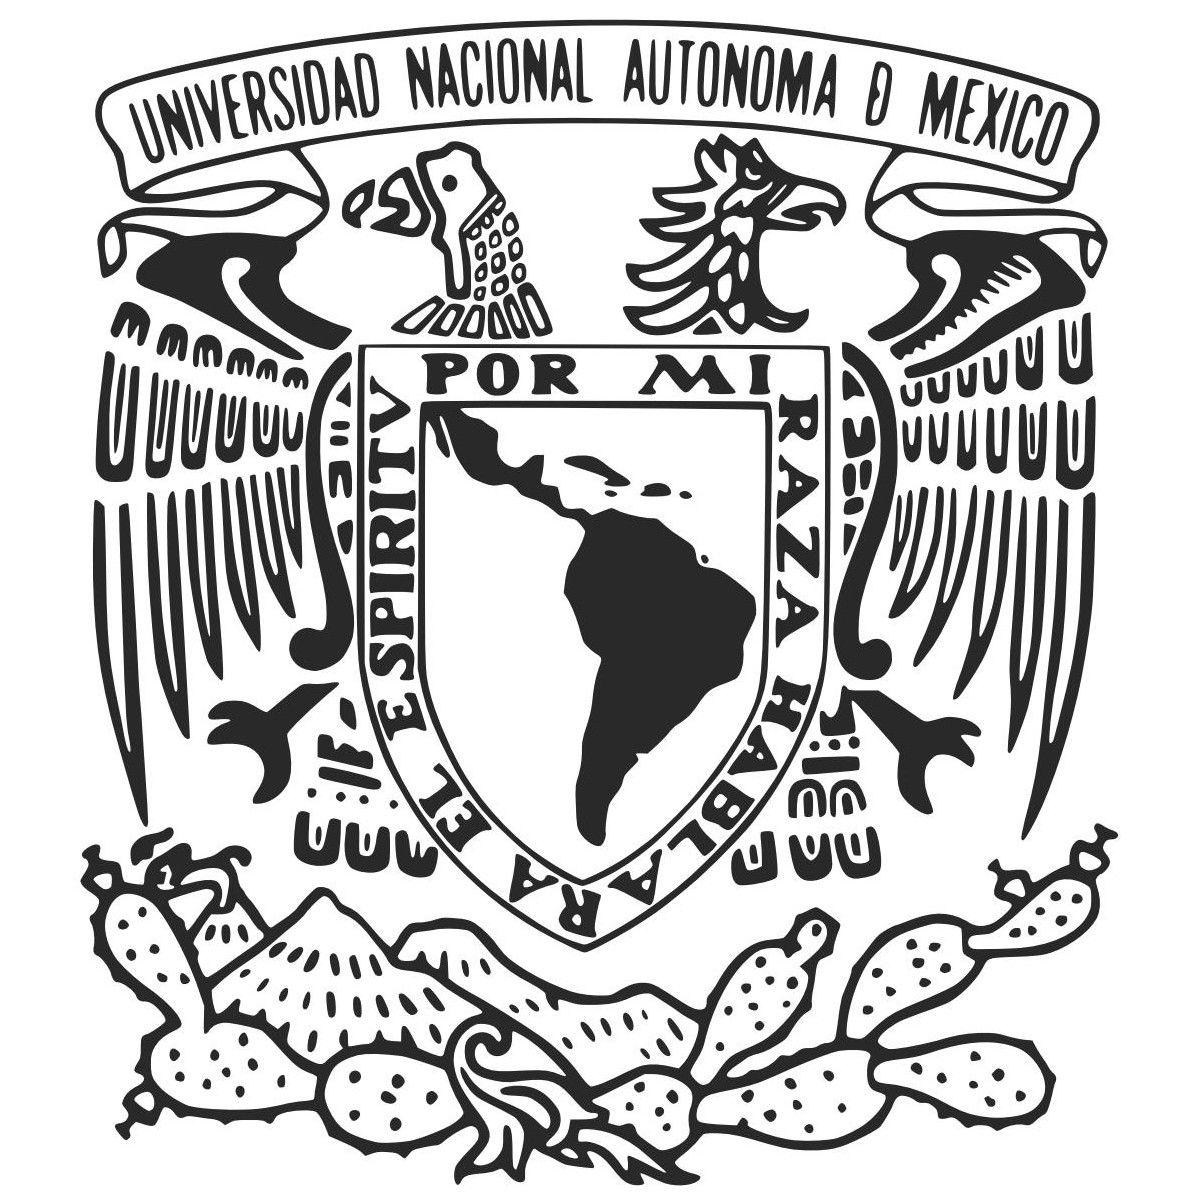 UNAM Logo [National Autonomous University of Mexico